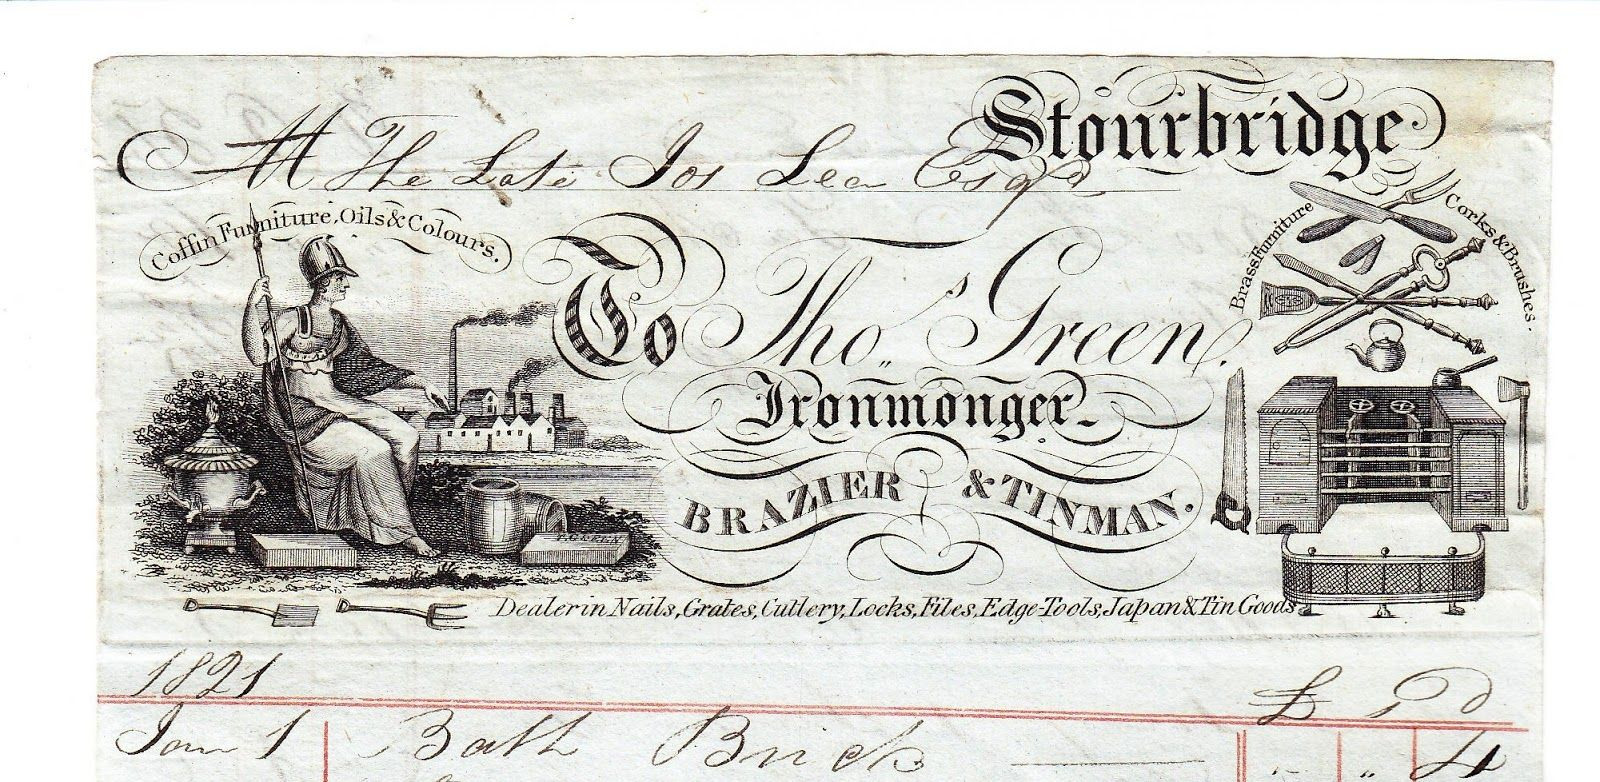 THE EPHEMERA OF BUSINESS: Newest editions to my collection - 1821 billhead Thomas Greene Ironmonger.